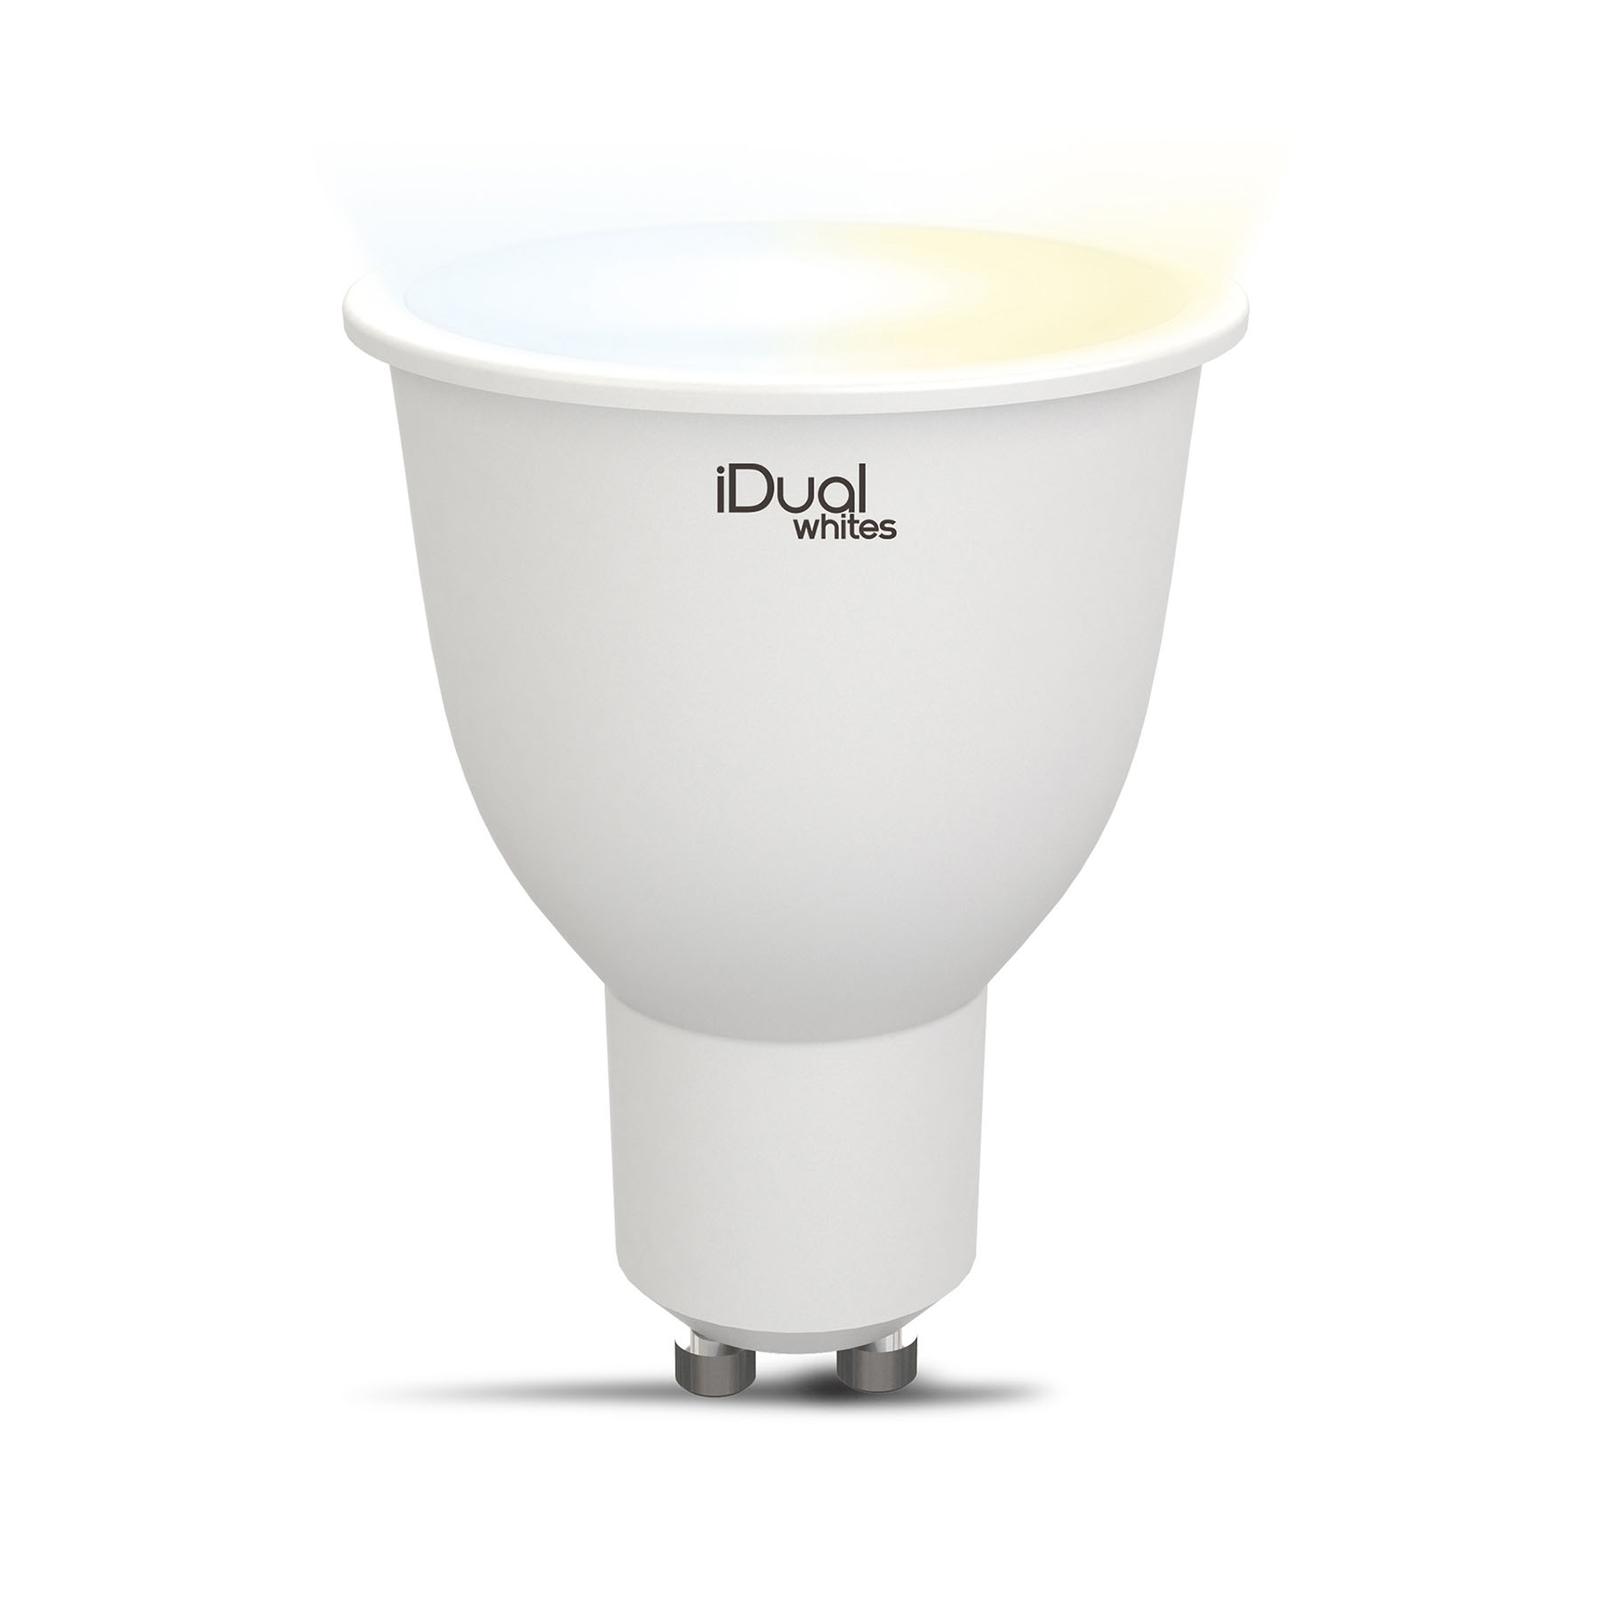 iDual Whites réflect. LED GU10 5,8W tunable white